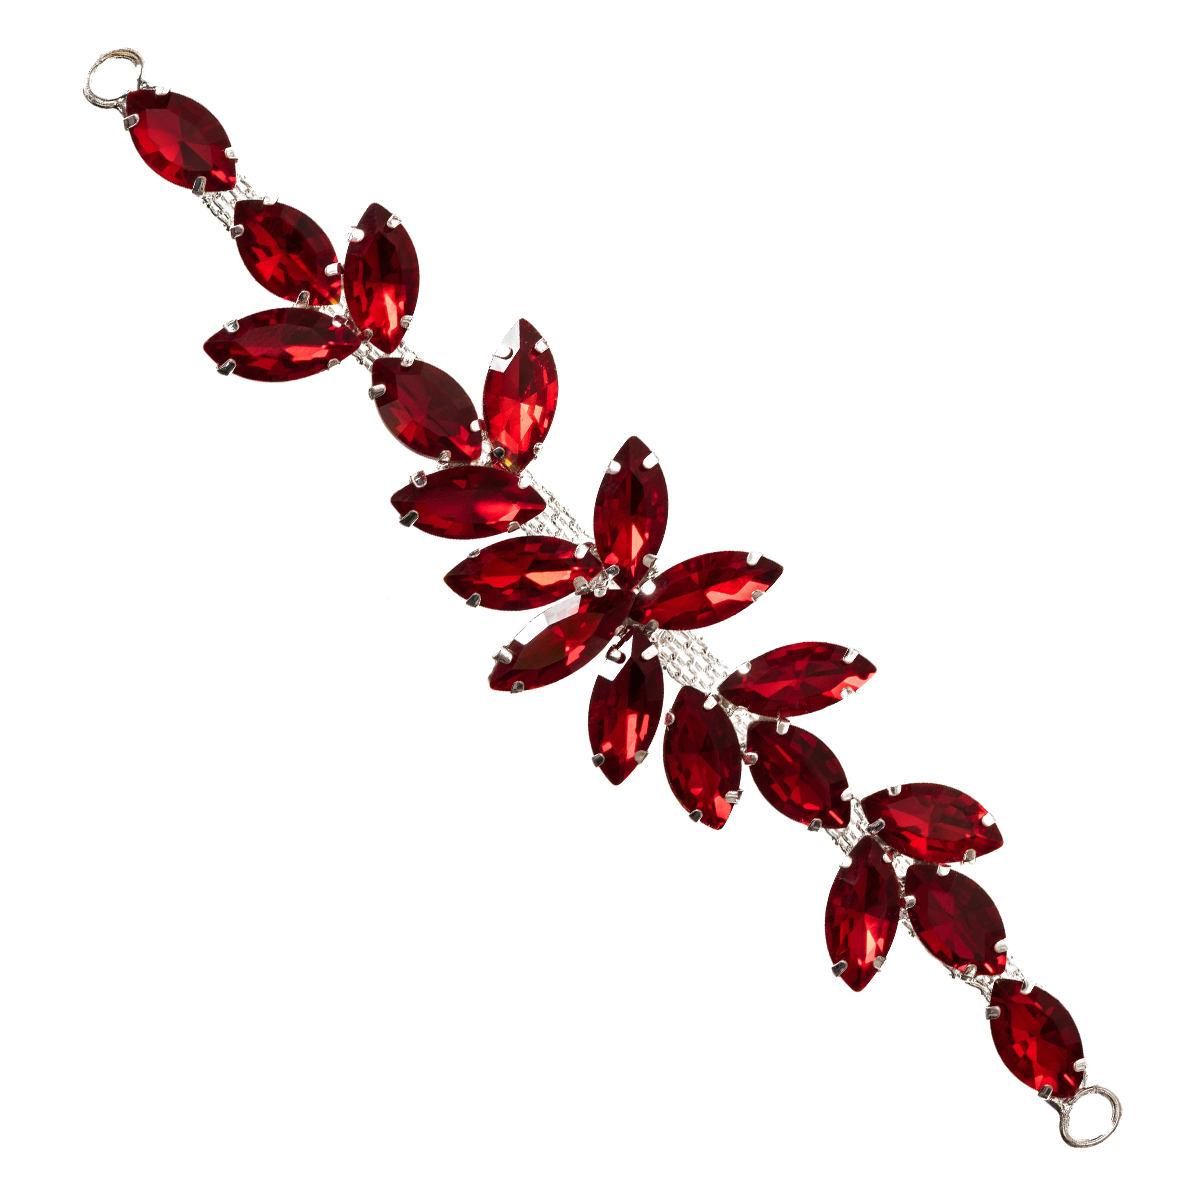 Rhinestone-Diamante-Motif-Applique-Sew-on-Crystal-Patch-for-Wedding-Bridal-Dress thumbnail 30